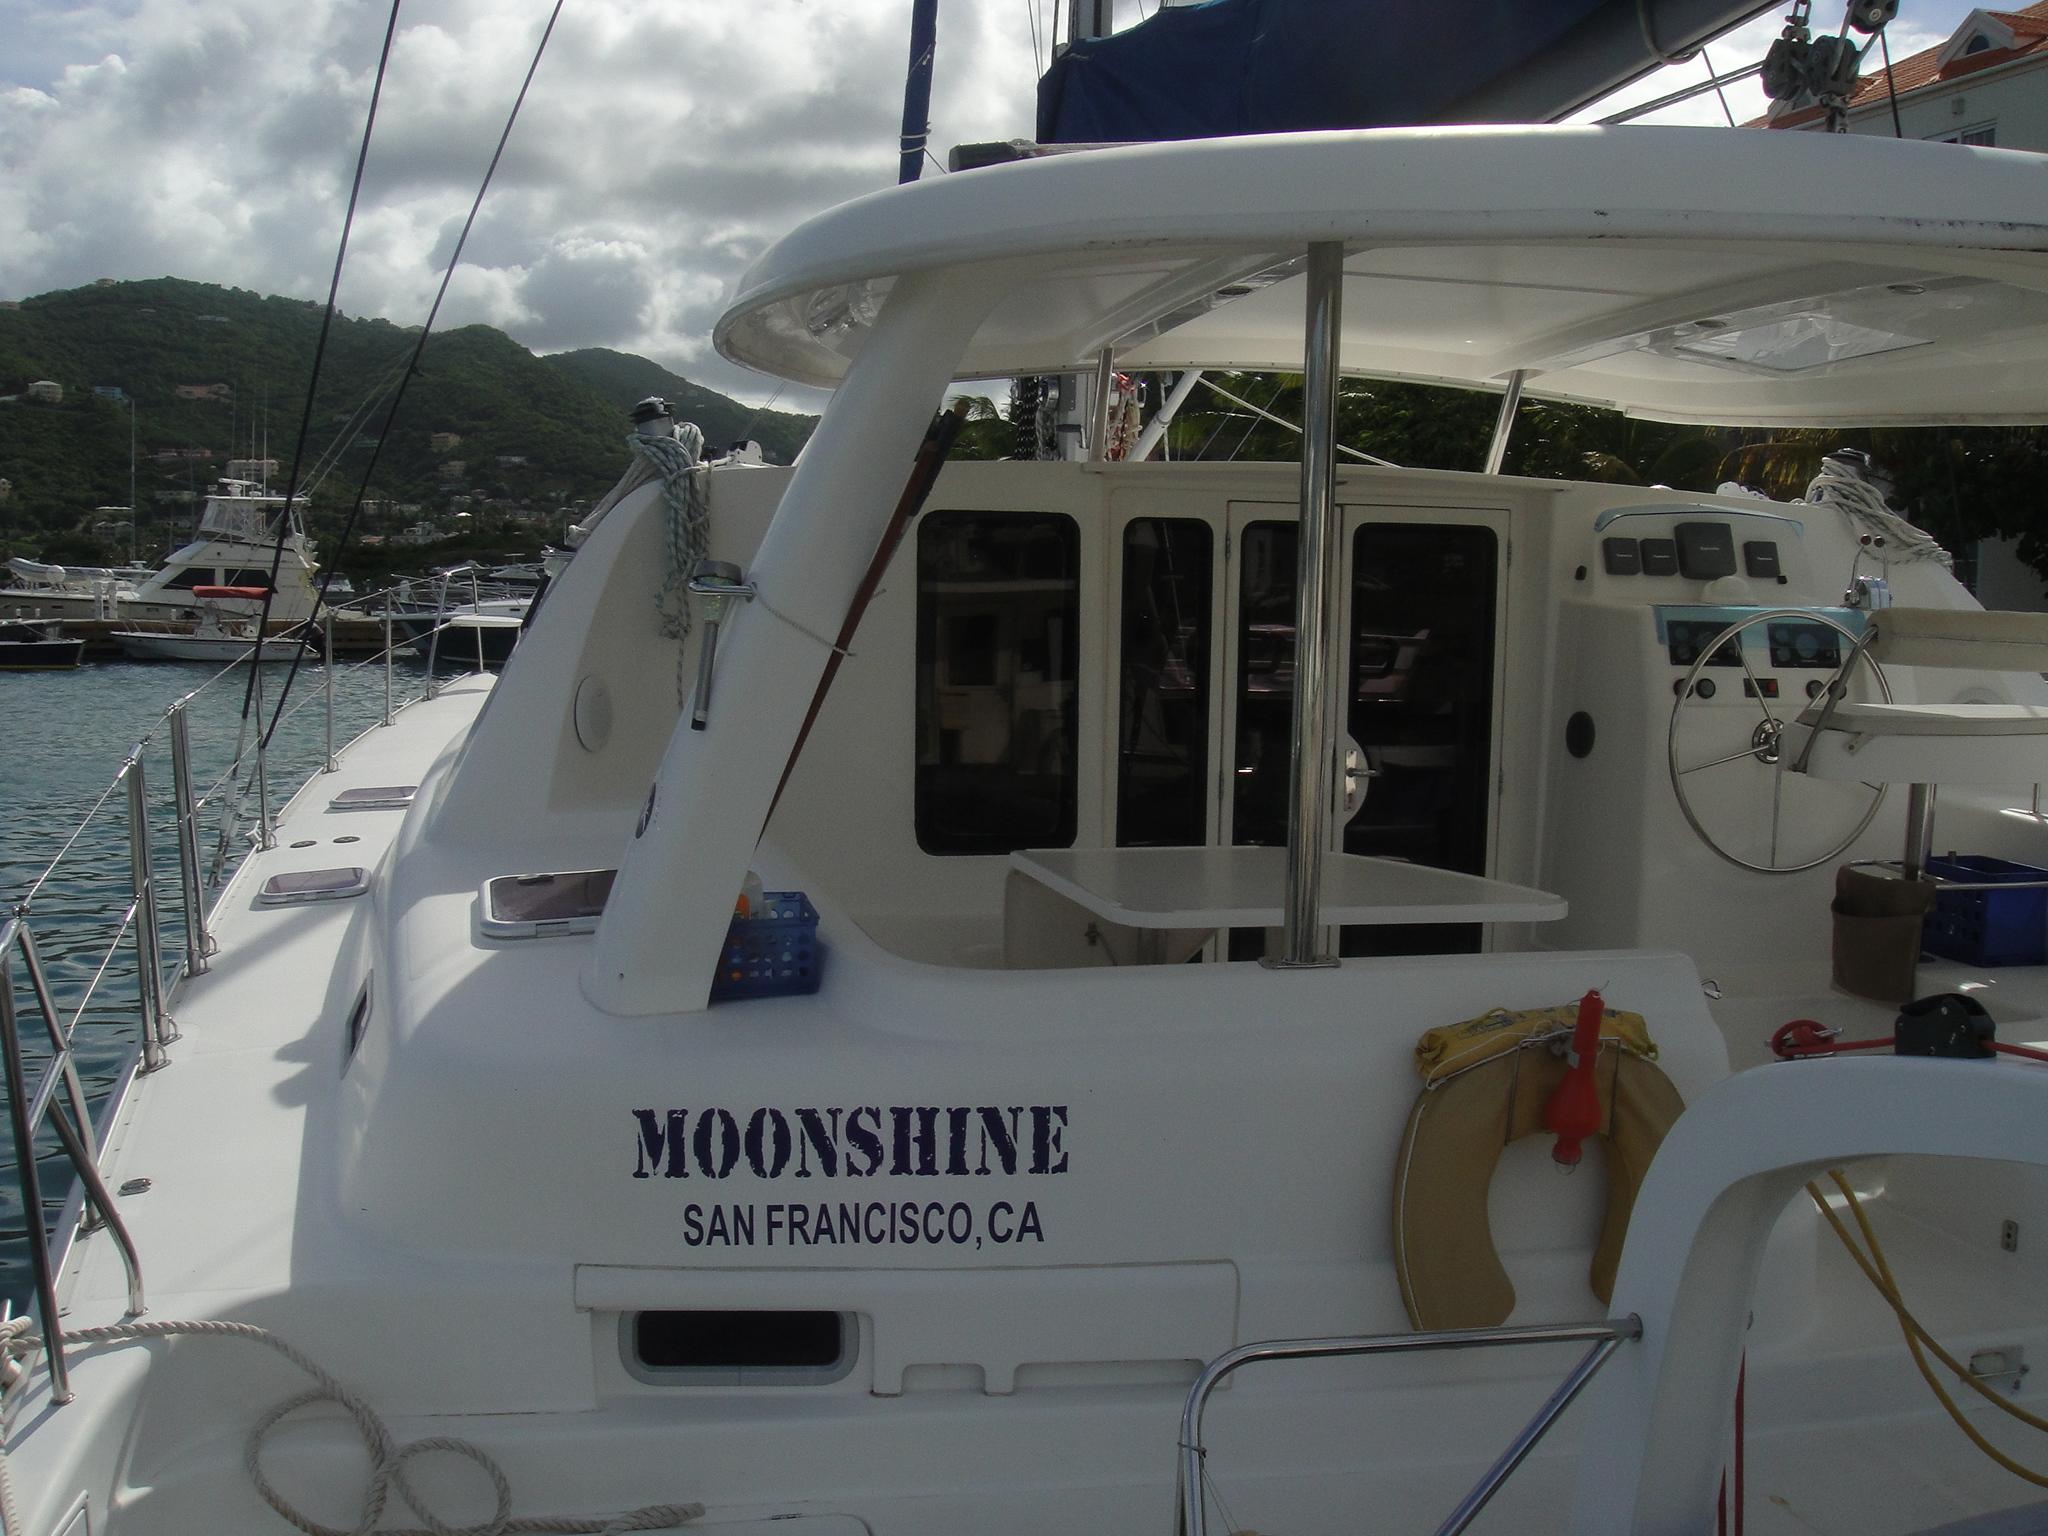 Moonshine 3.JPG